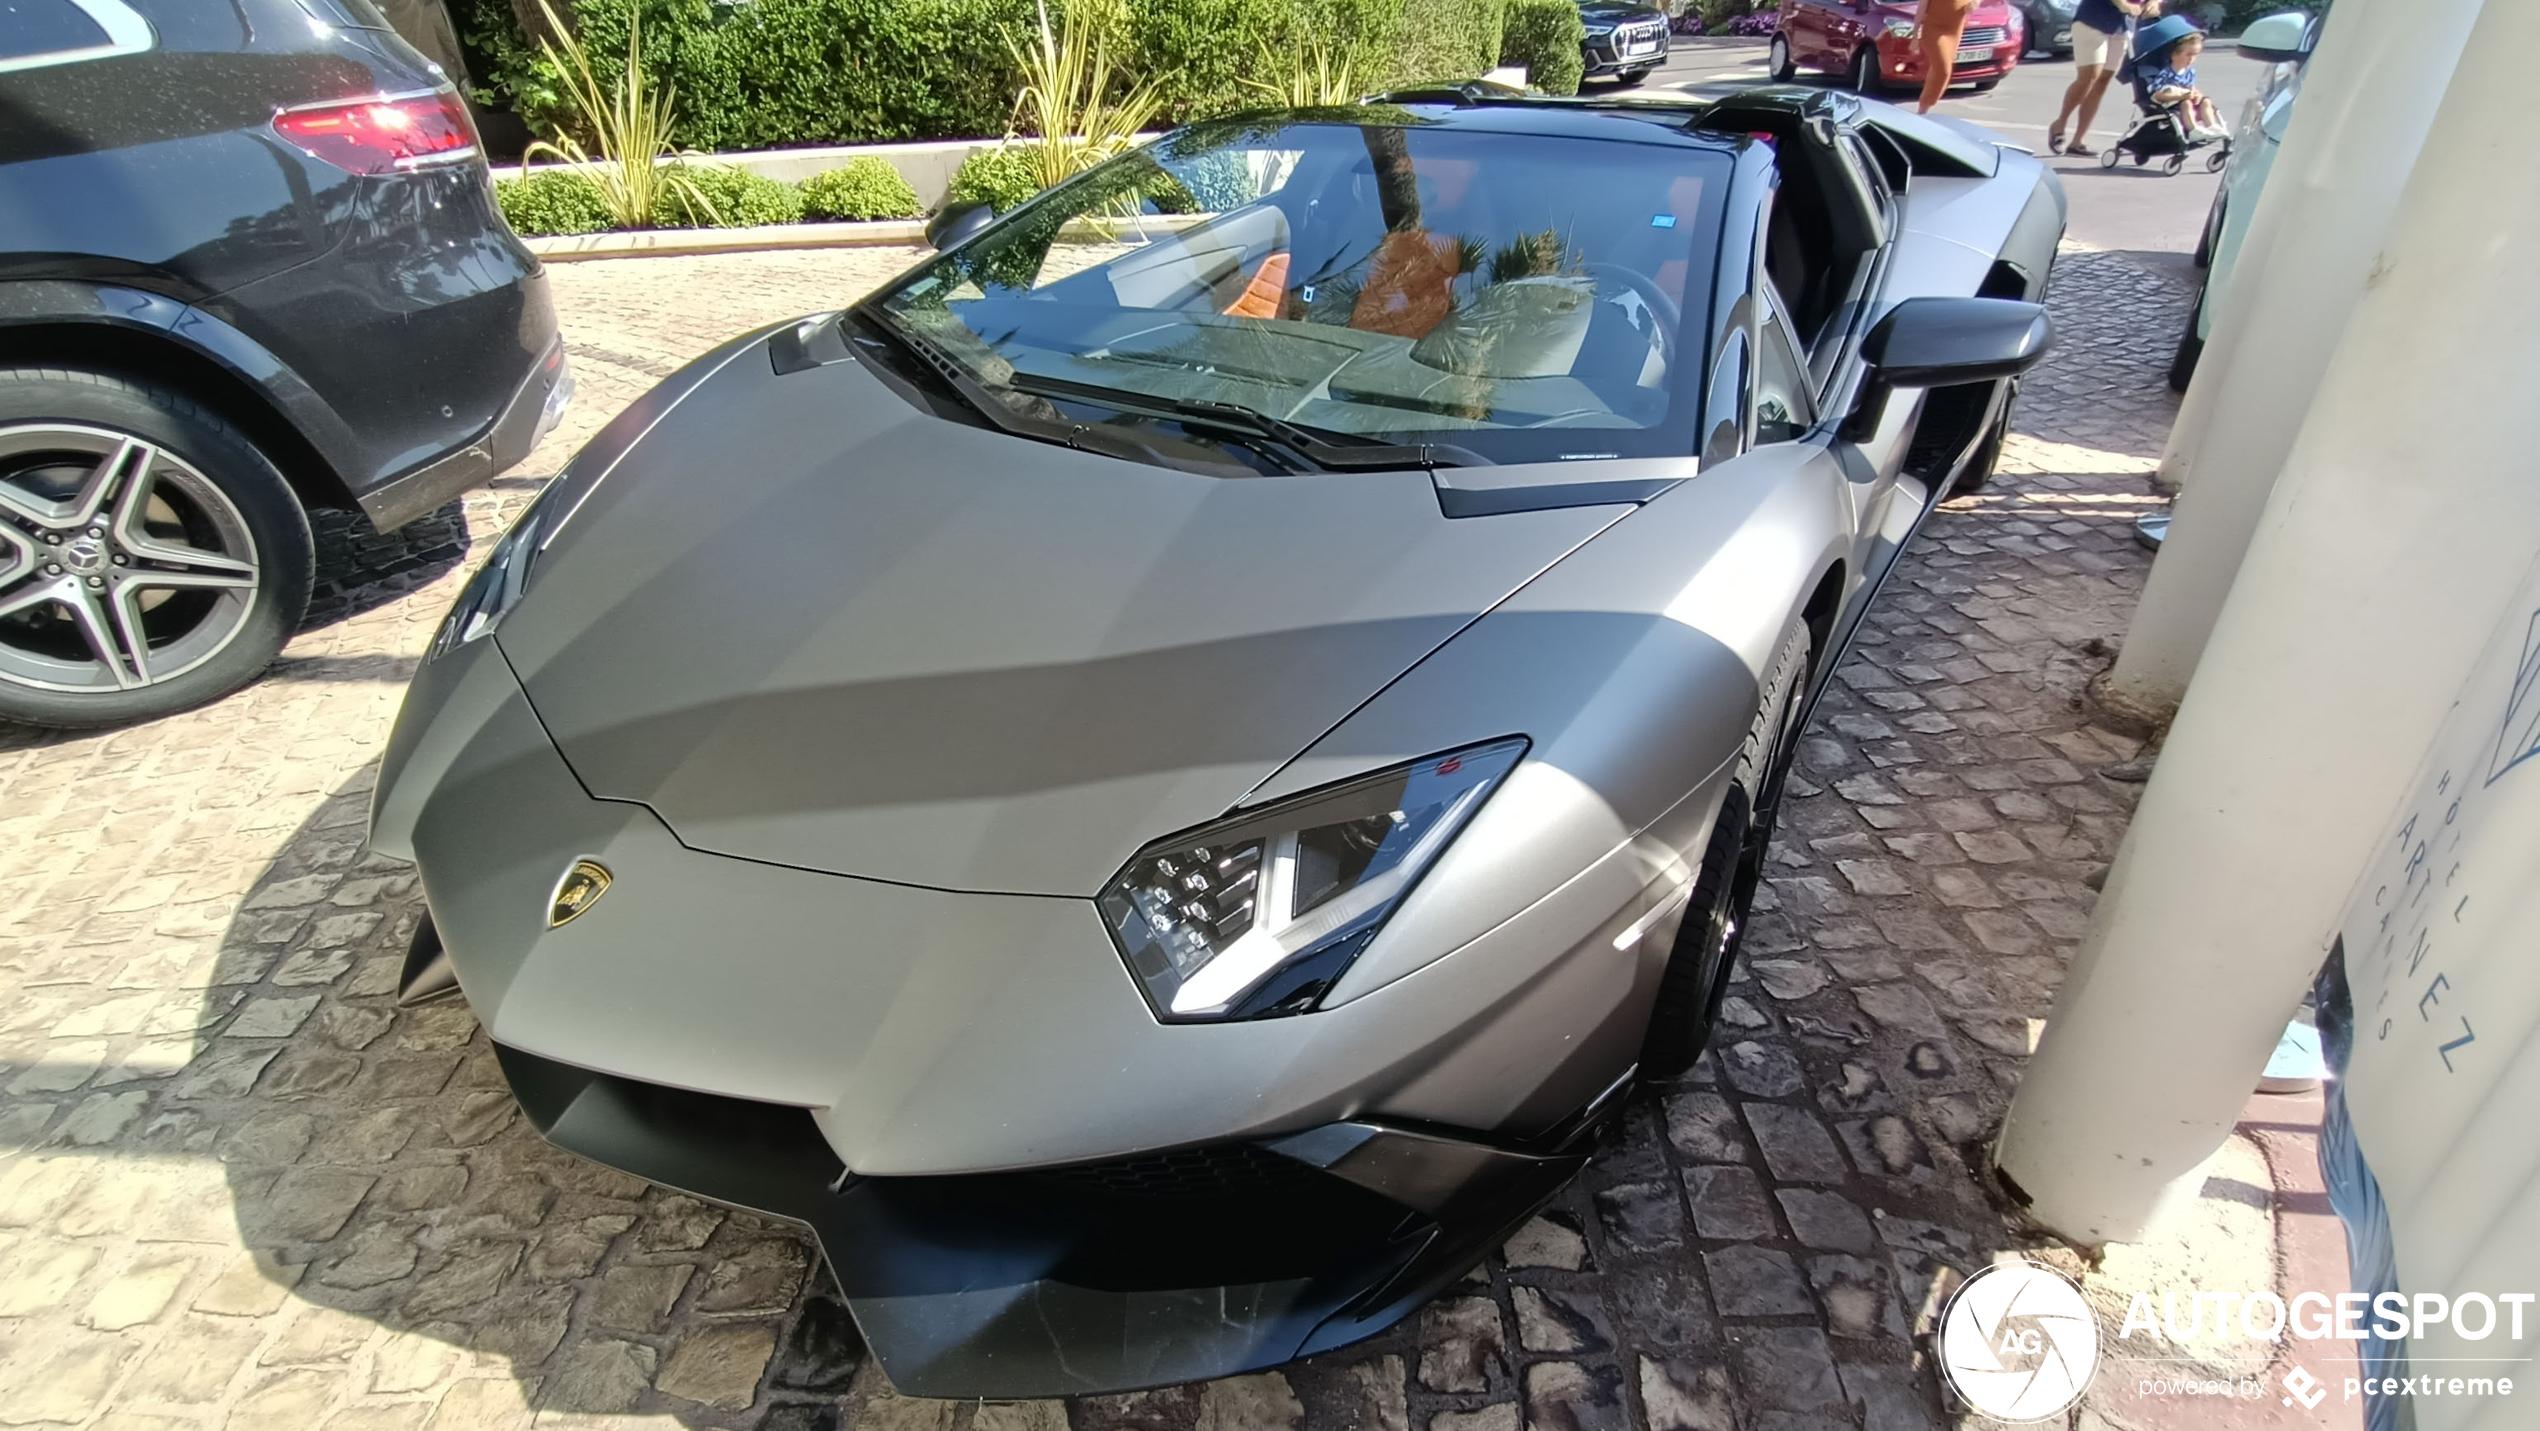 LamborghiniAventador LP720-4 Roadster 50° Anniversario